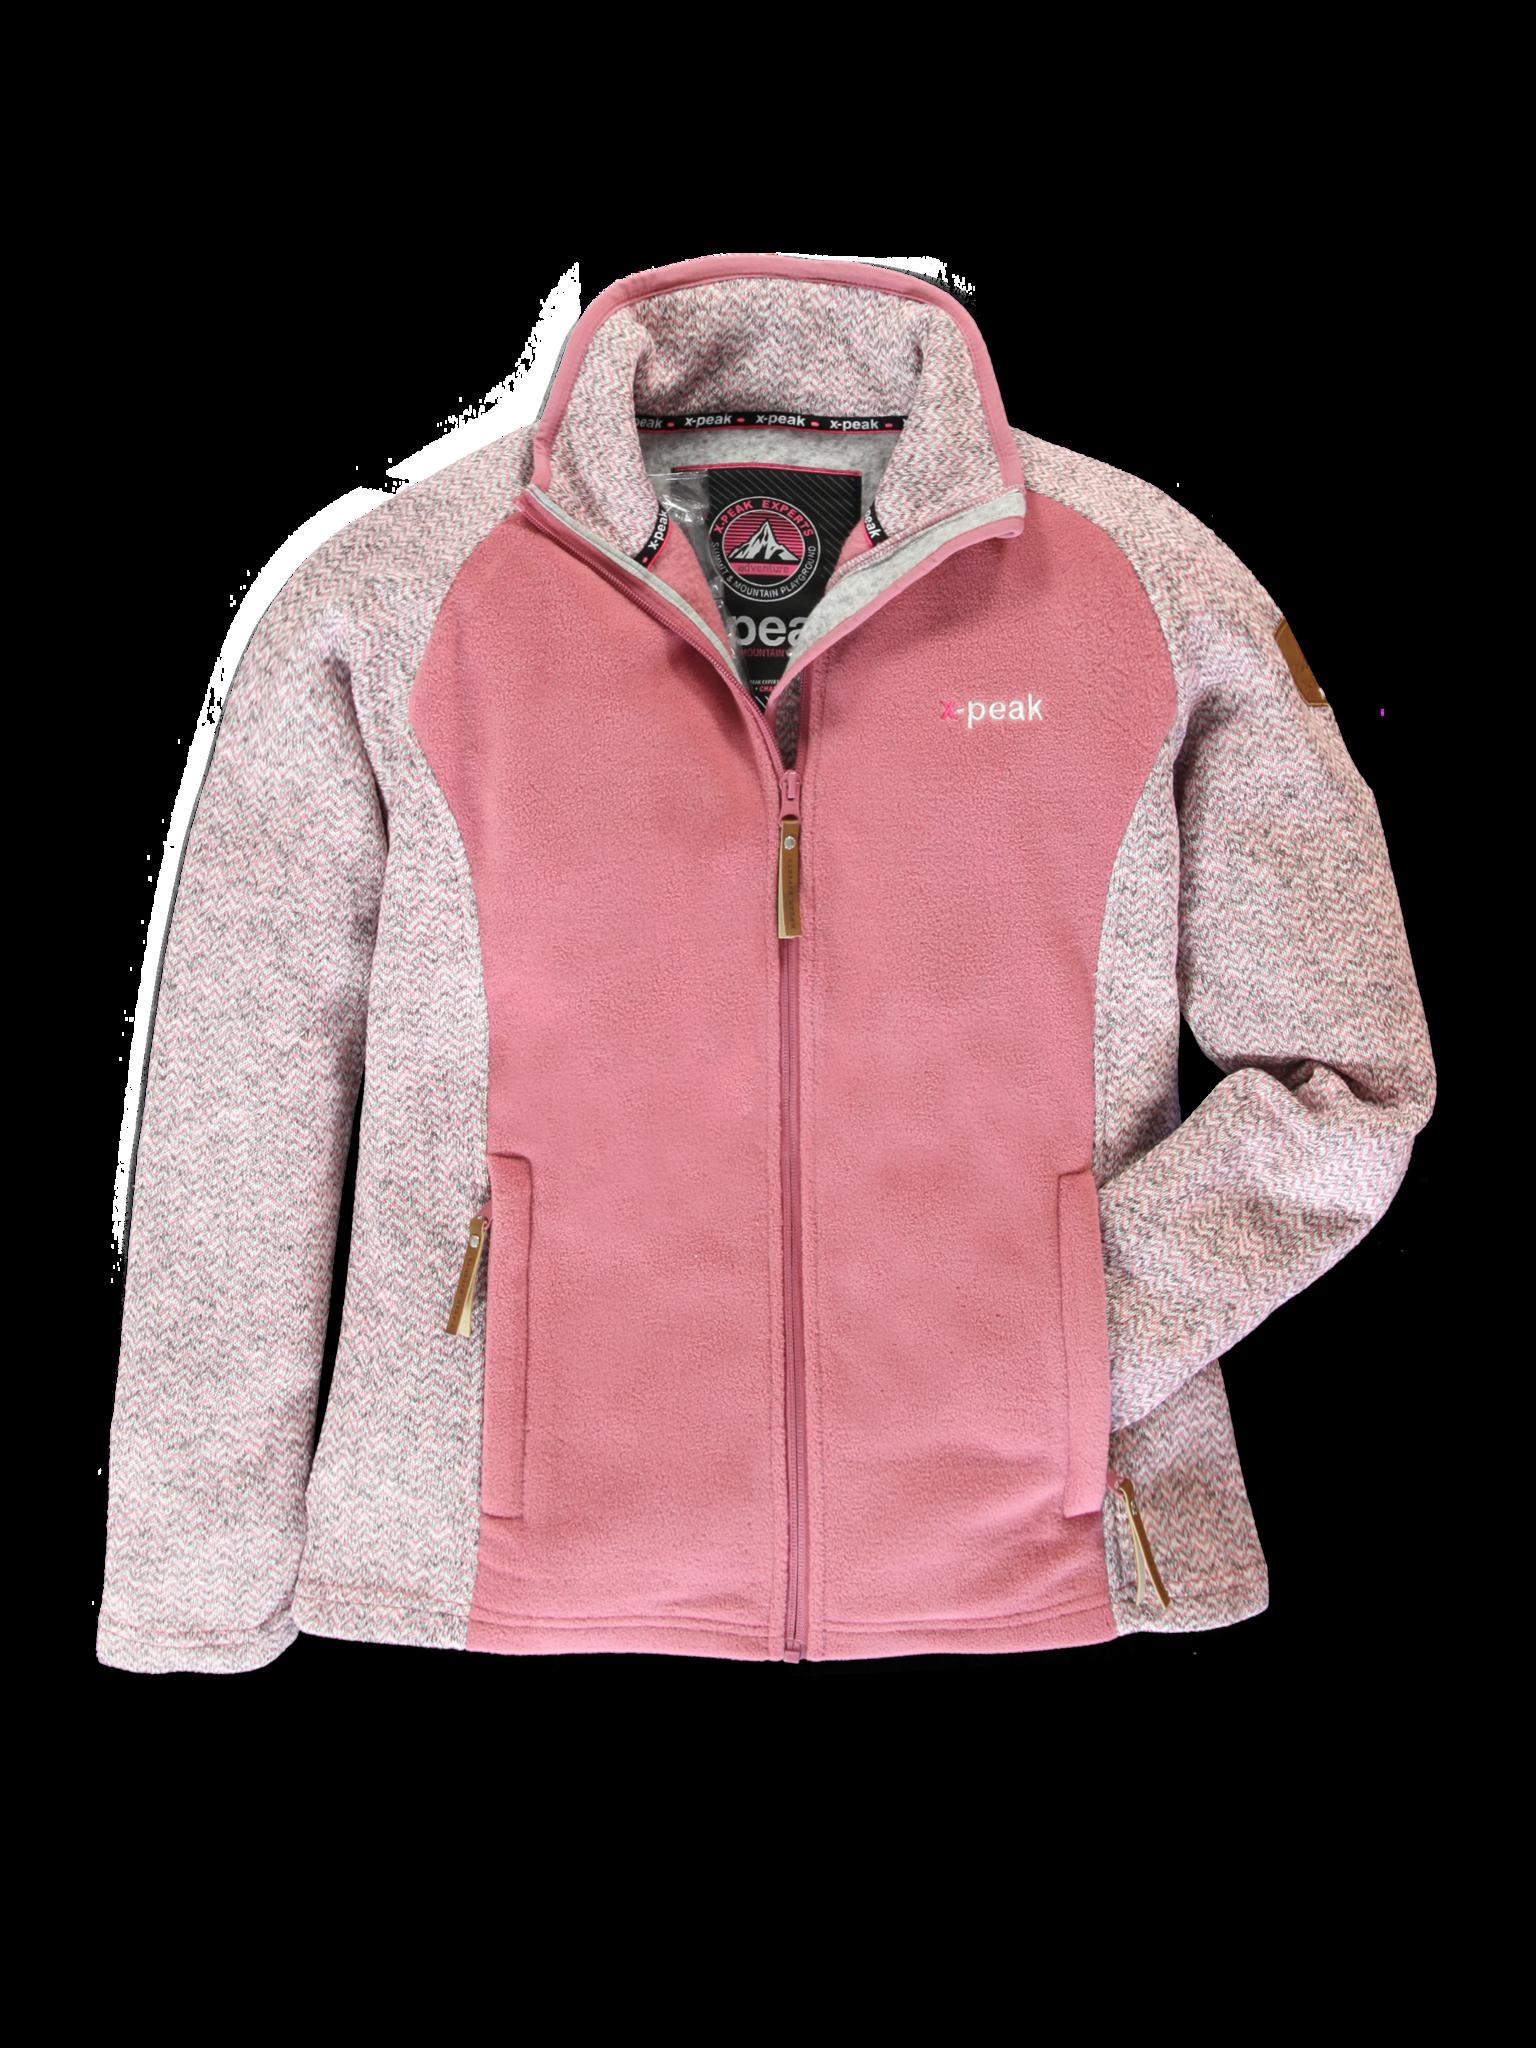 All Brands   Winterproducts Ladies   Cardigan Sweater   18 pcs/box